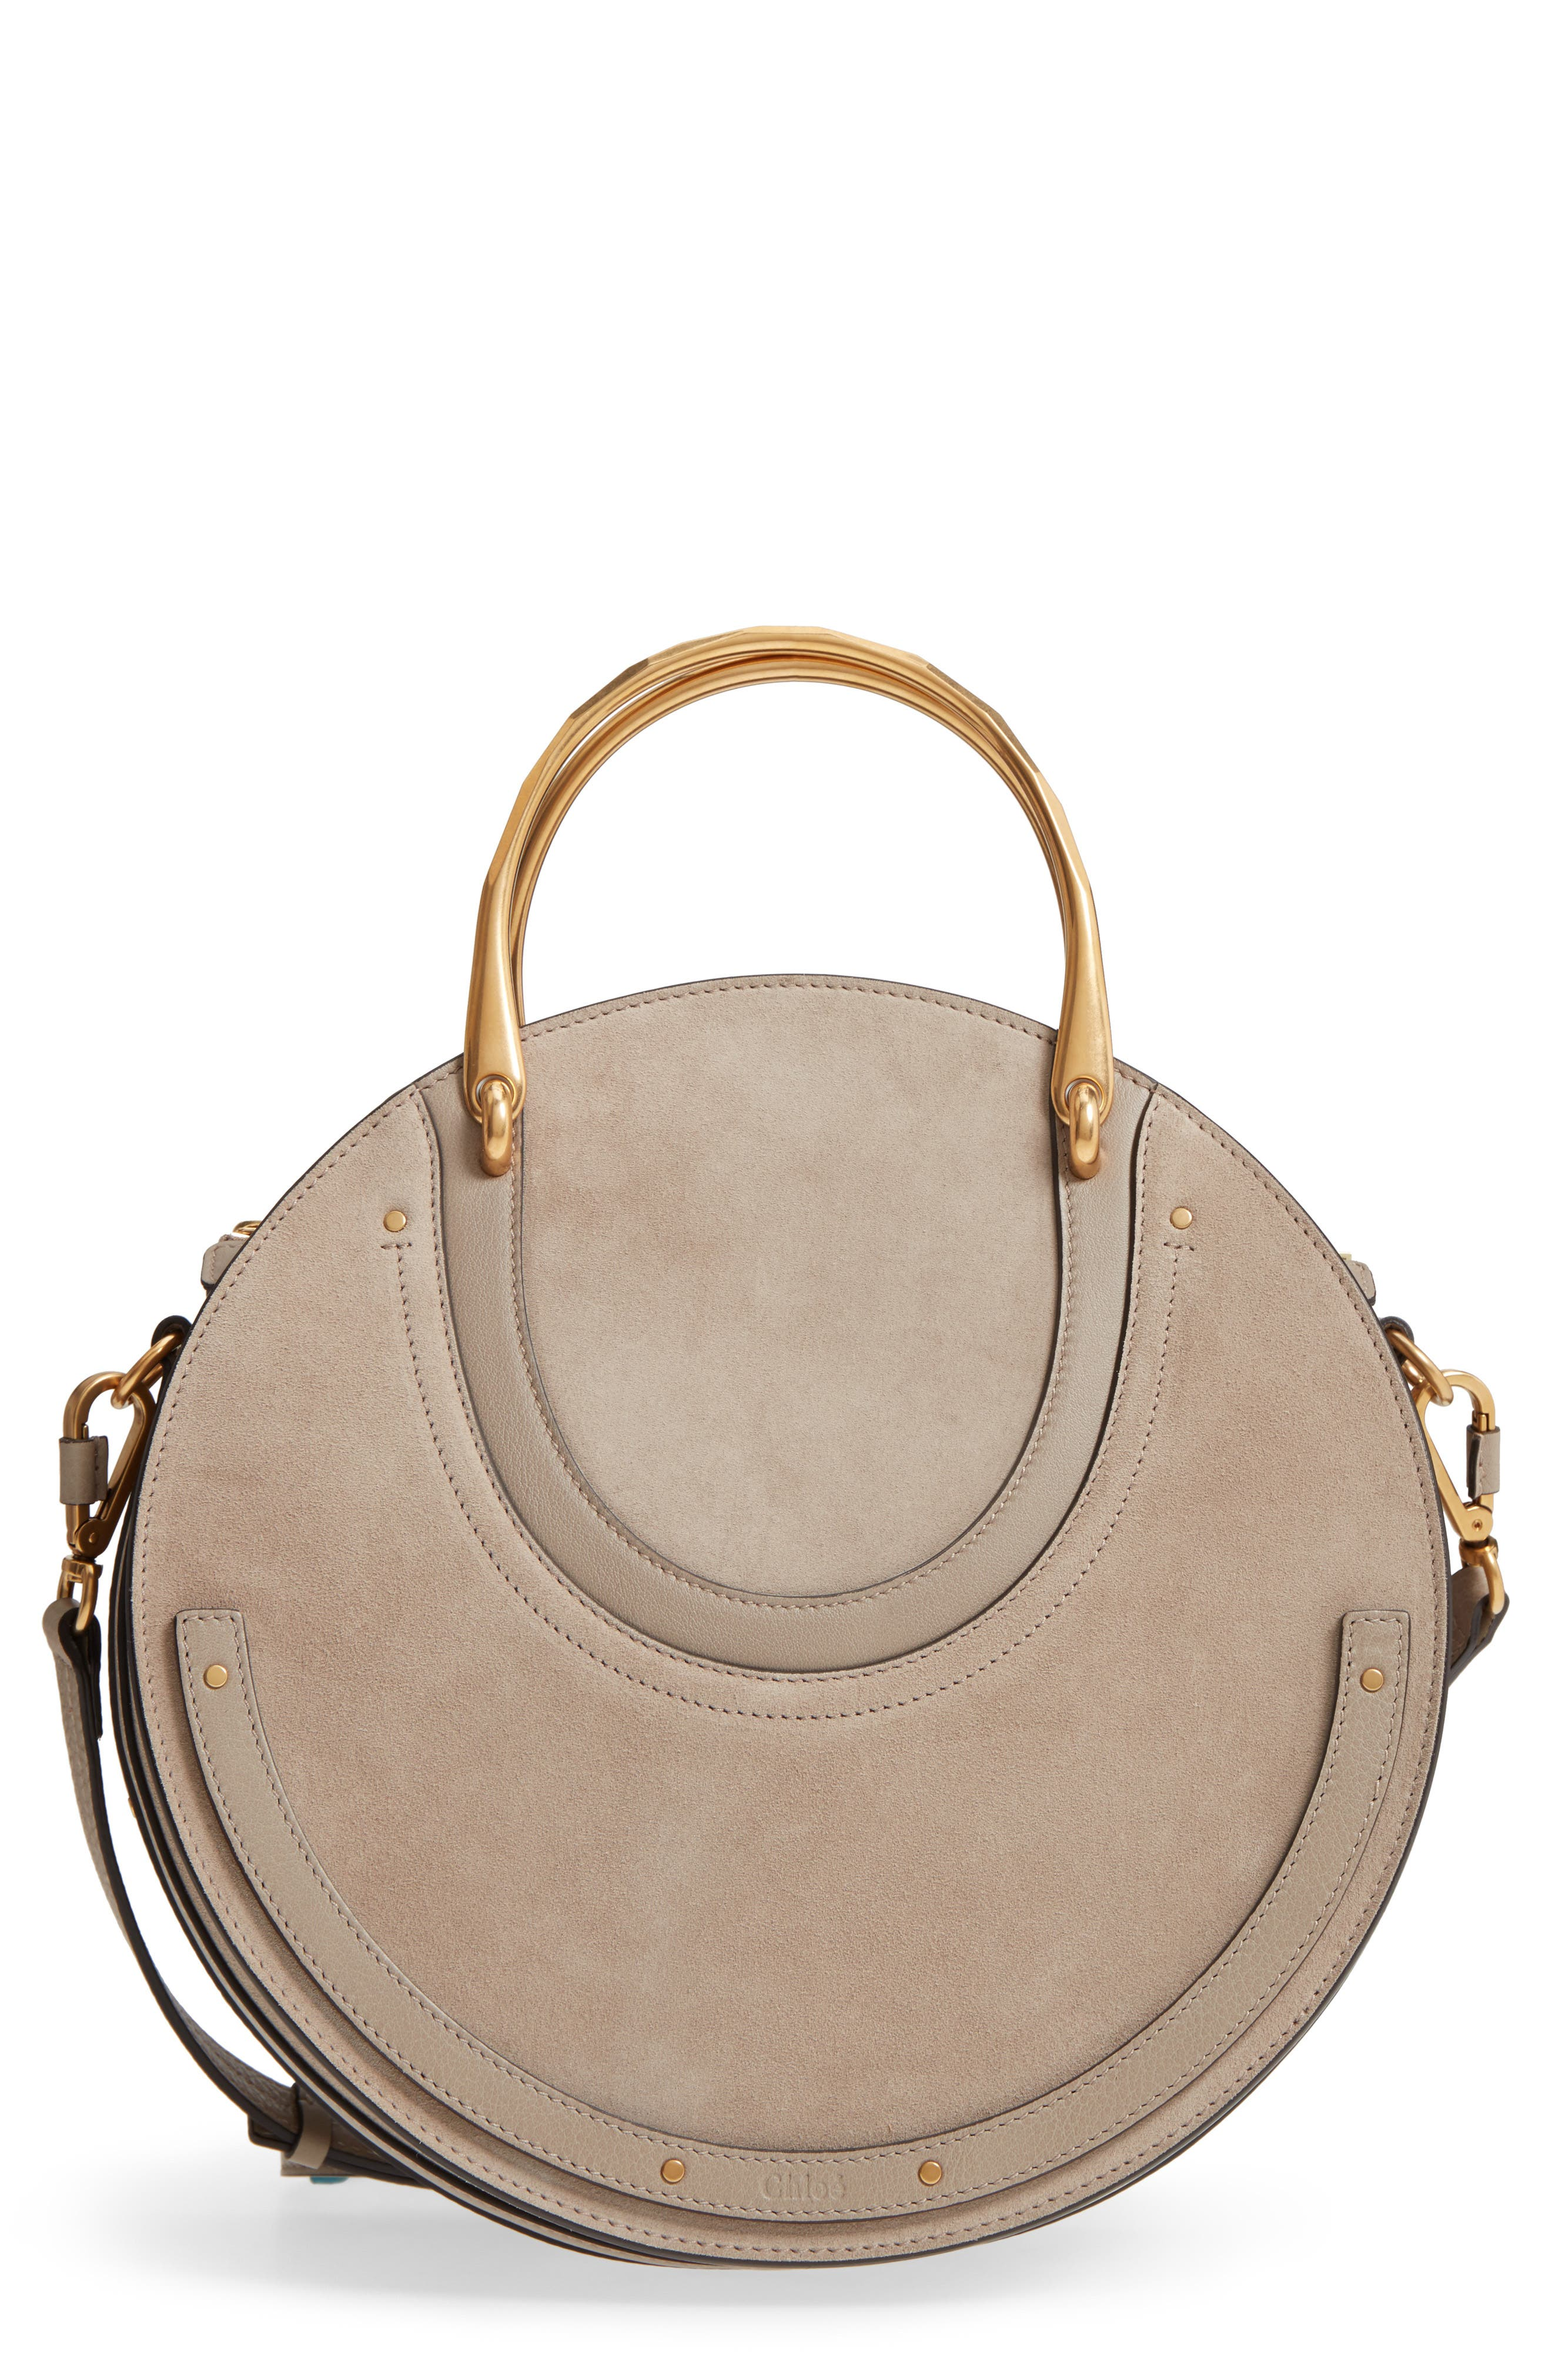 Pixie Maxi Calfskin Suede/Leather Satchel,                         Main,                         color,